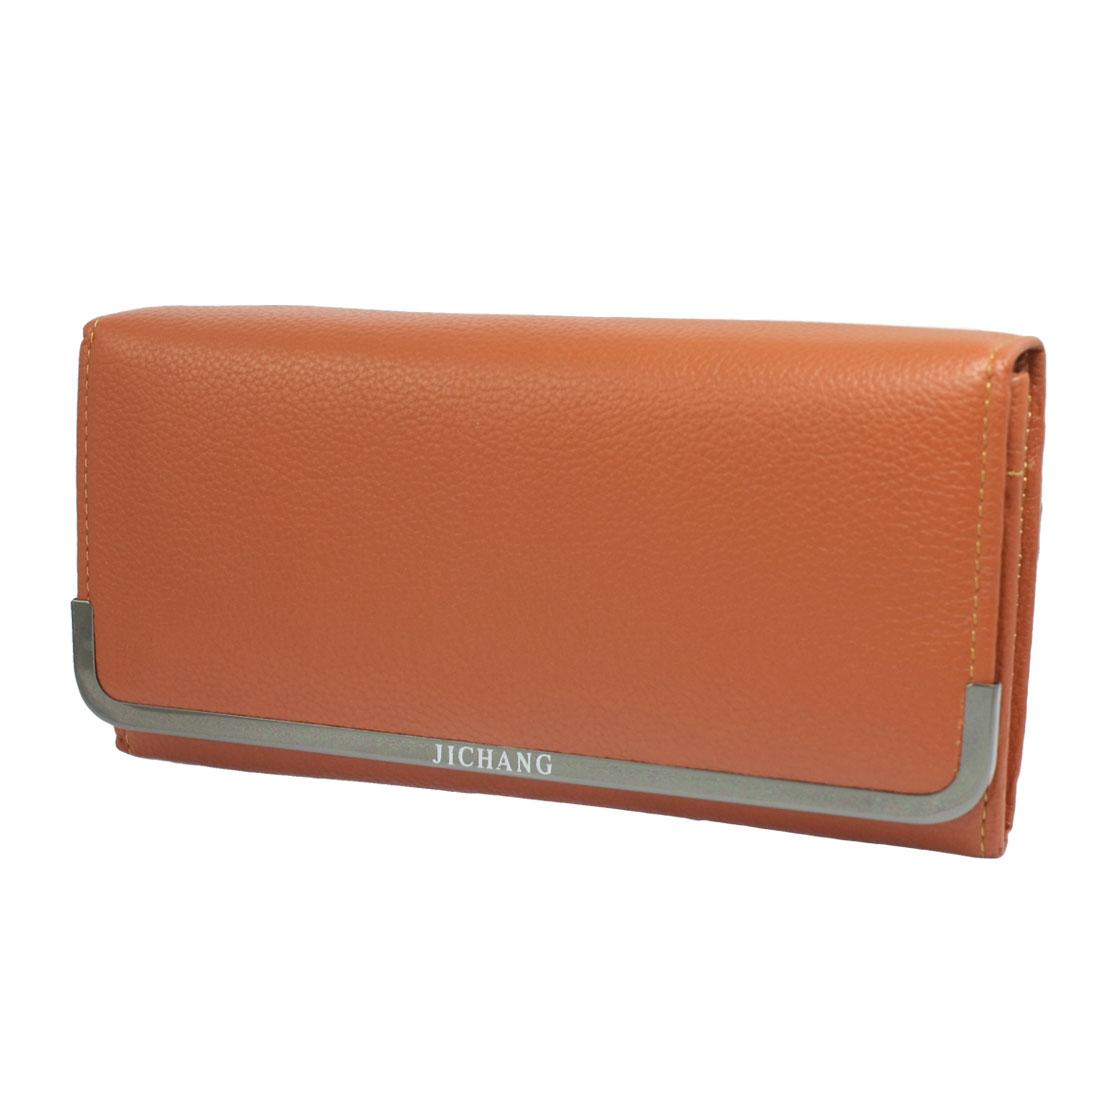 Ladies 5 Compartments Brown Faux Leather Wallet Purse Bag Cash Holder